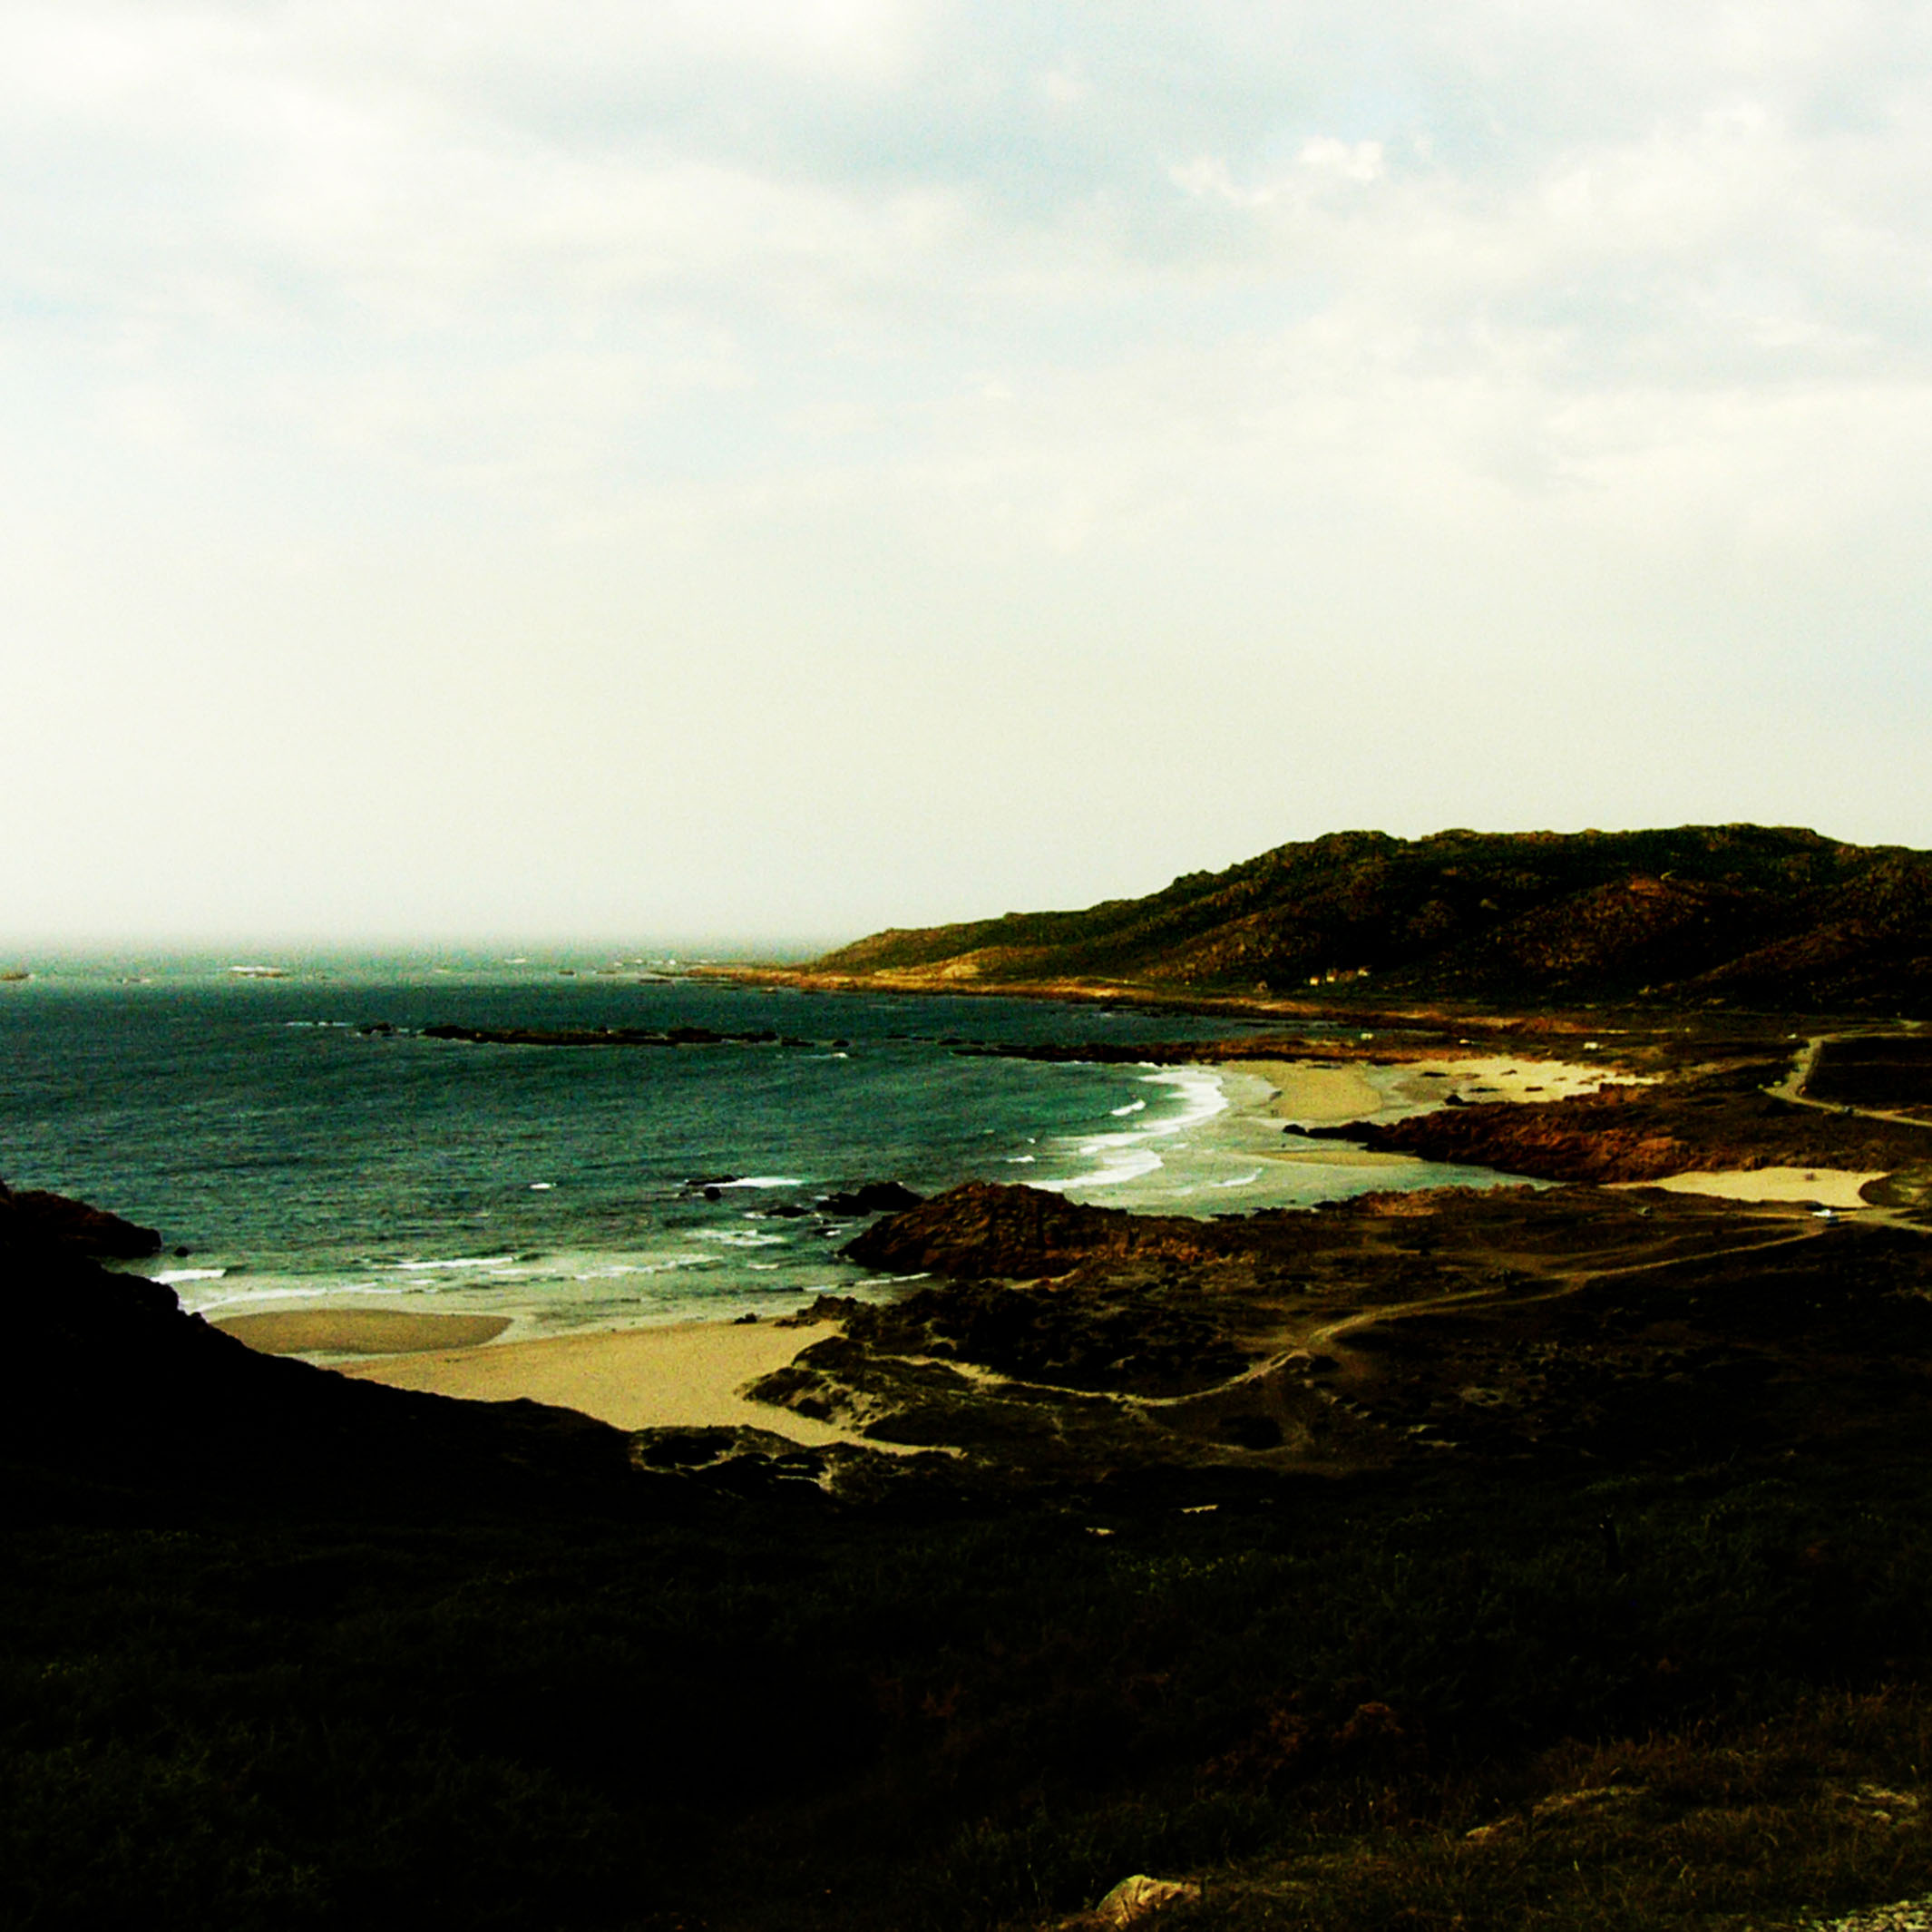 Landscape (Foto: Lena Sudmann)